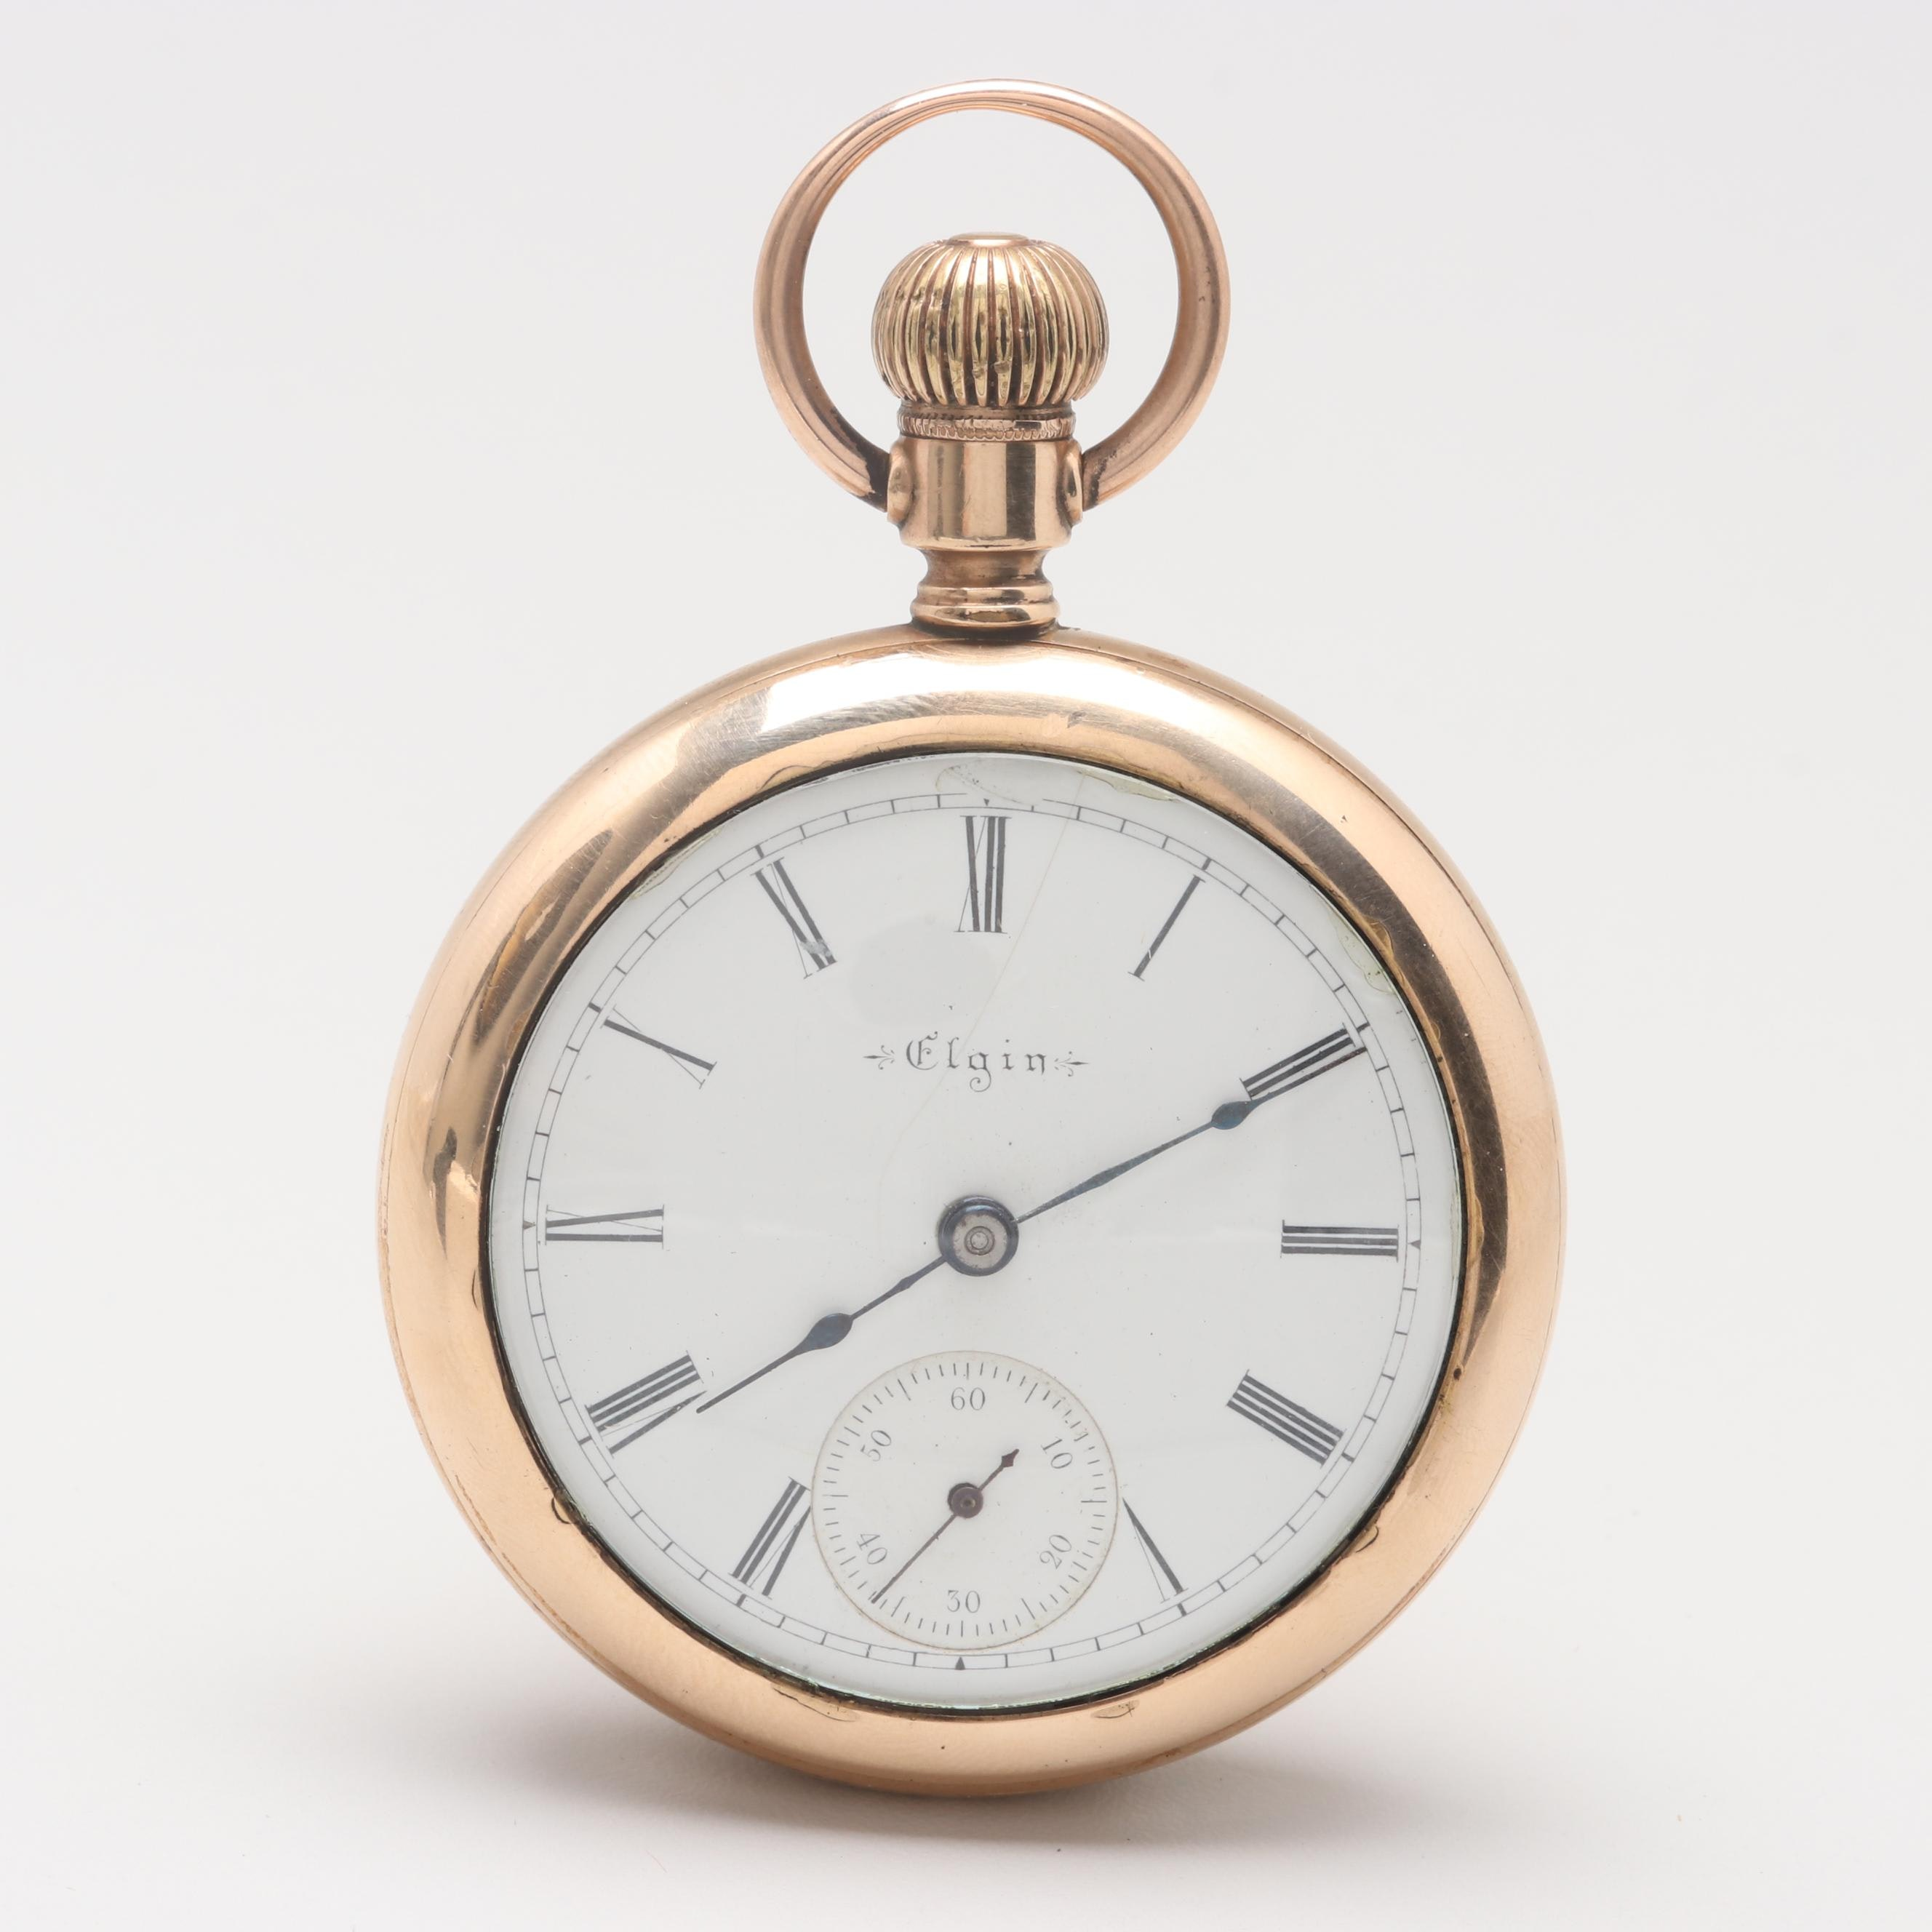 Circa 1897 Elgin Gold Filled Pocket Watch